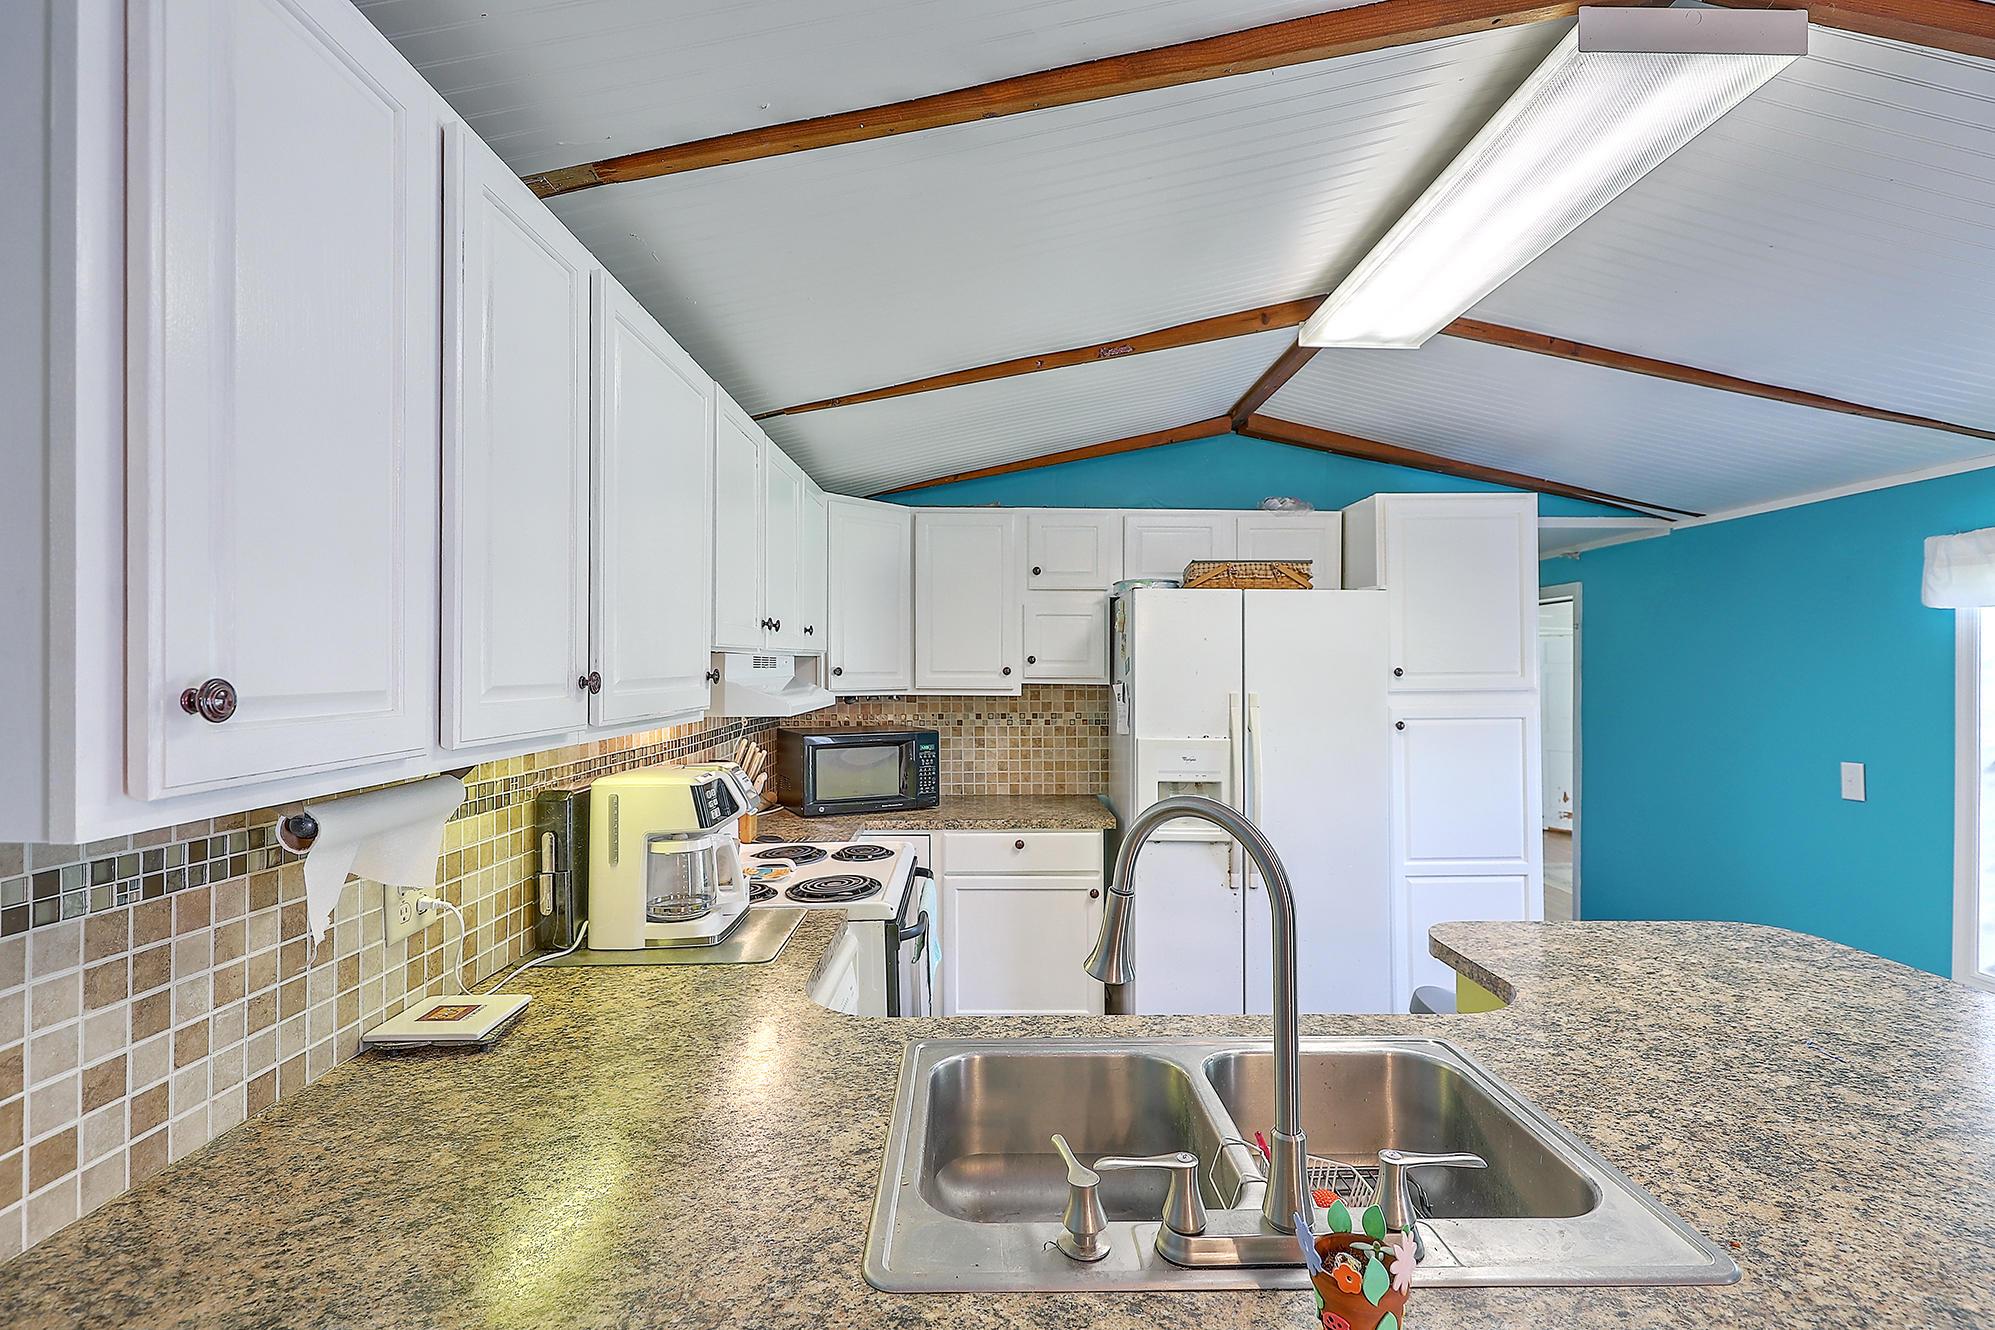 Cross Area (West) Homes For Sale - 128 Cherry Grove, Cross, SC - 40